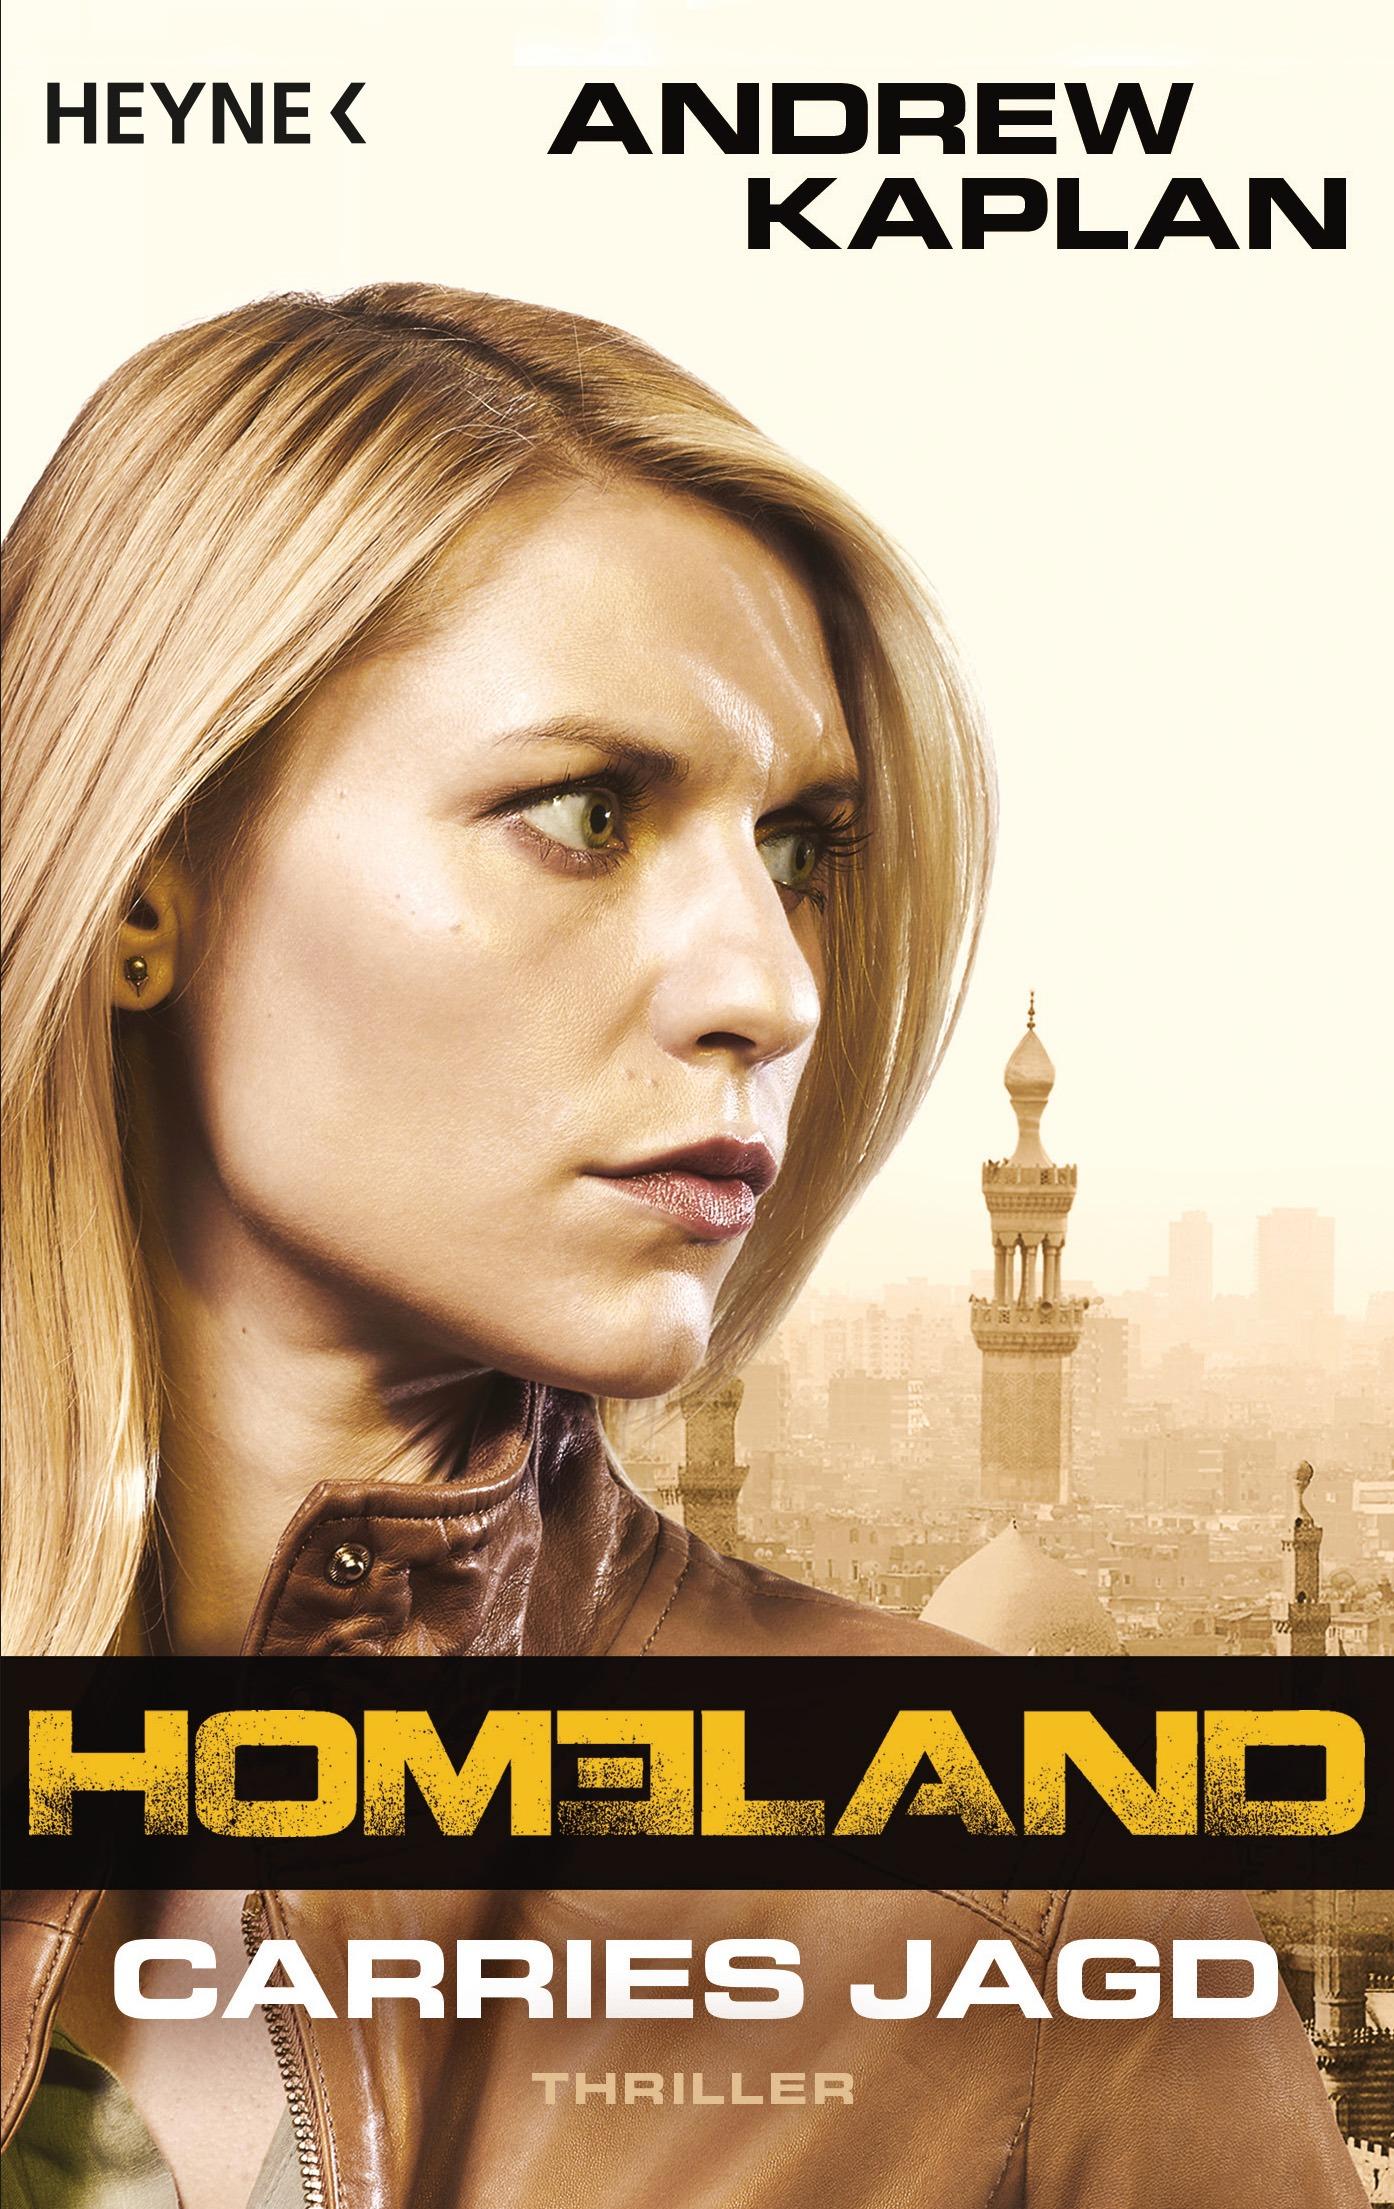 Homeland: Carries Jagd - Andrew Kaplan